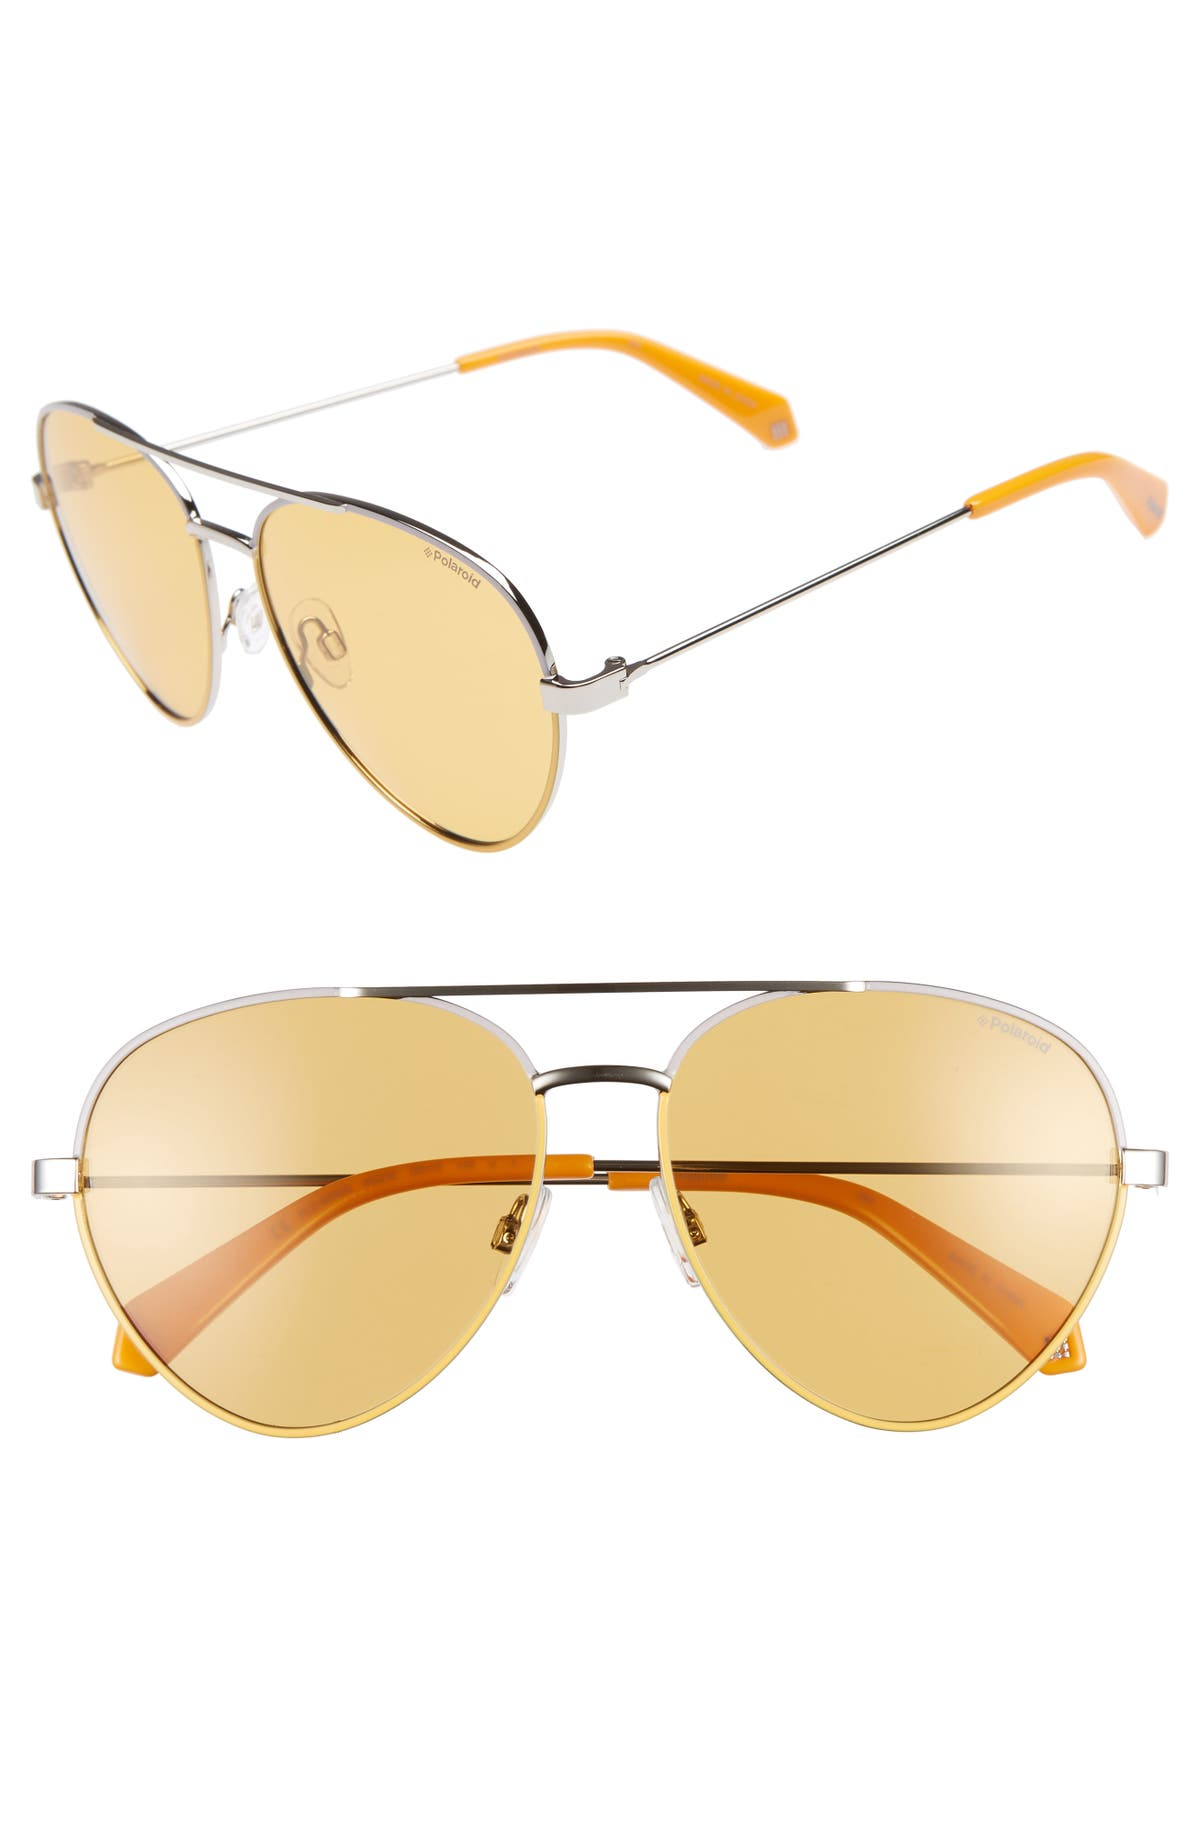 31f98915c Polaroid 59mm Polarized Aviator Sunglasses | Nordstrom